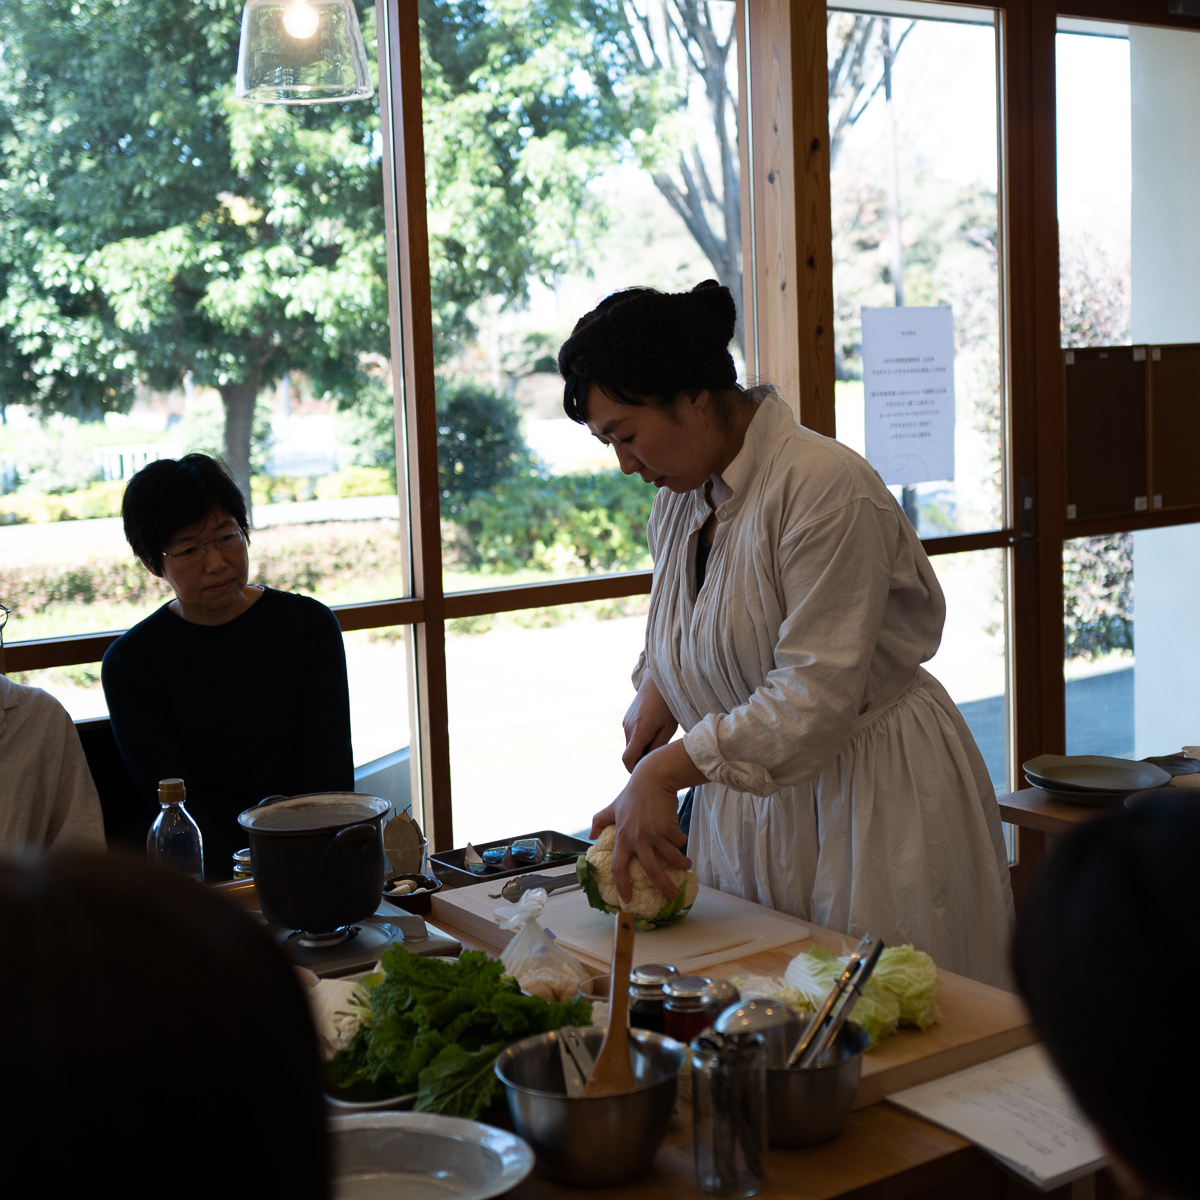 park | 【あたらしい日常料理 ふじわら 藤原奈緒さんの 料理教室と 食事会】11月21日開催